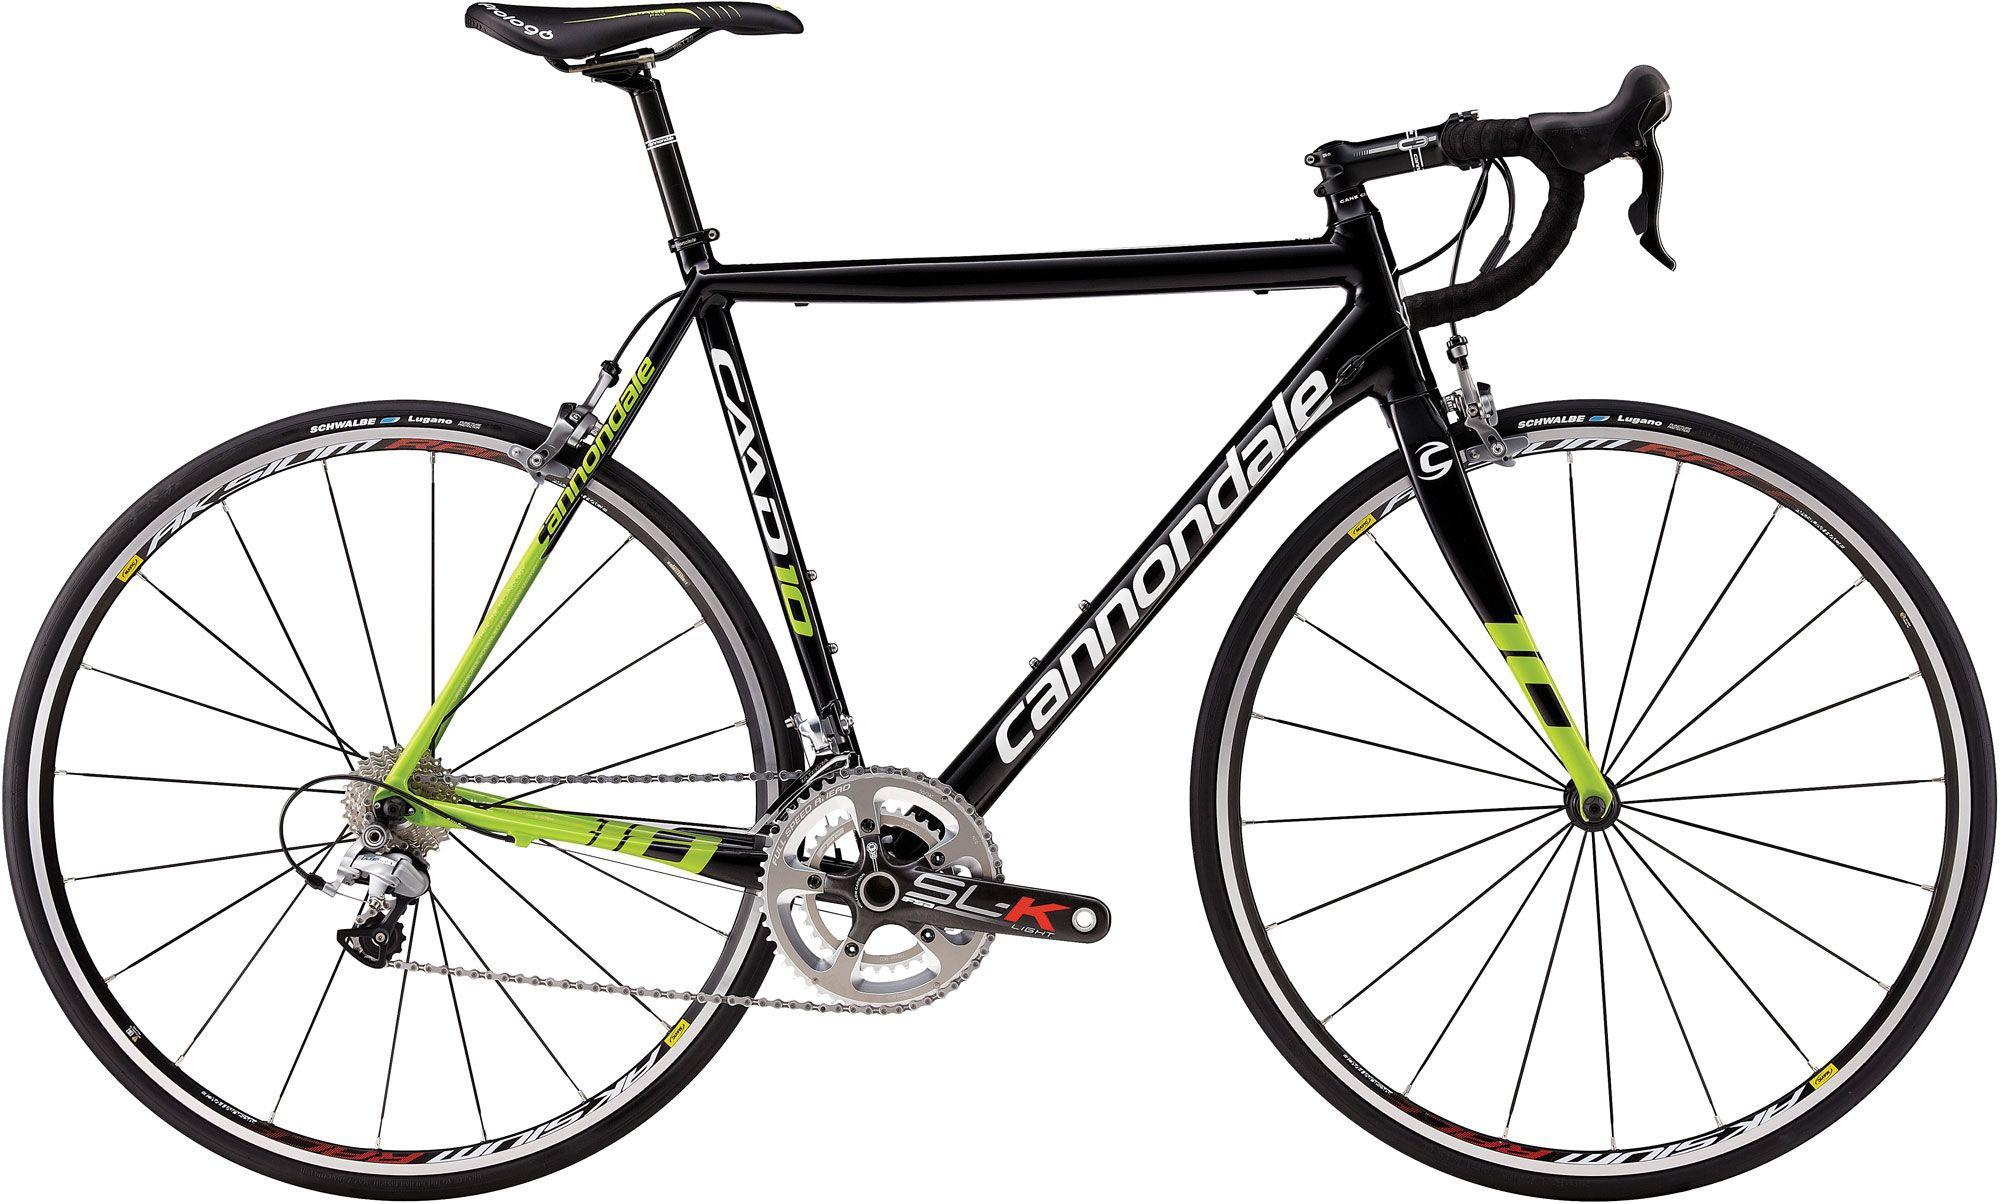 5754f76b026 Cannondale CAAD10 3 - Ridgewood Cycle Shop 35 North Broad Street ...